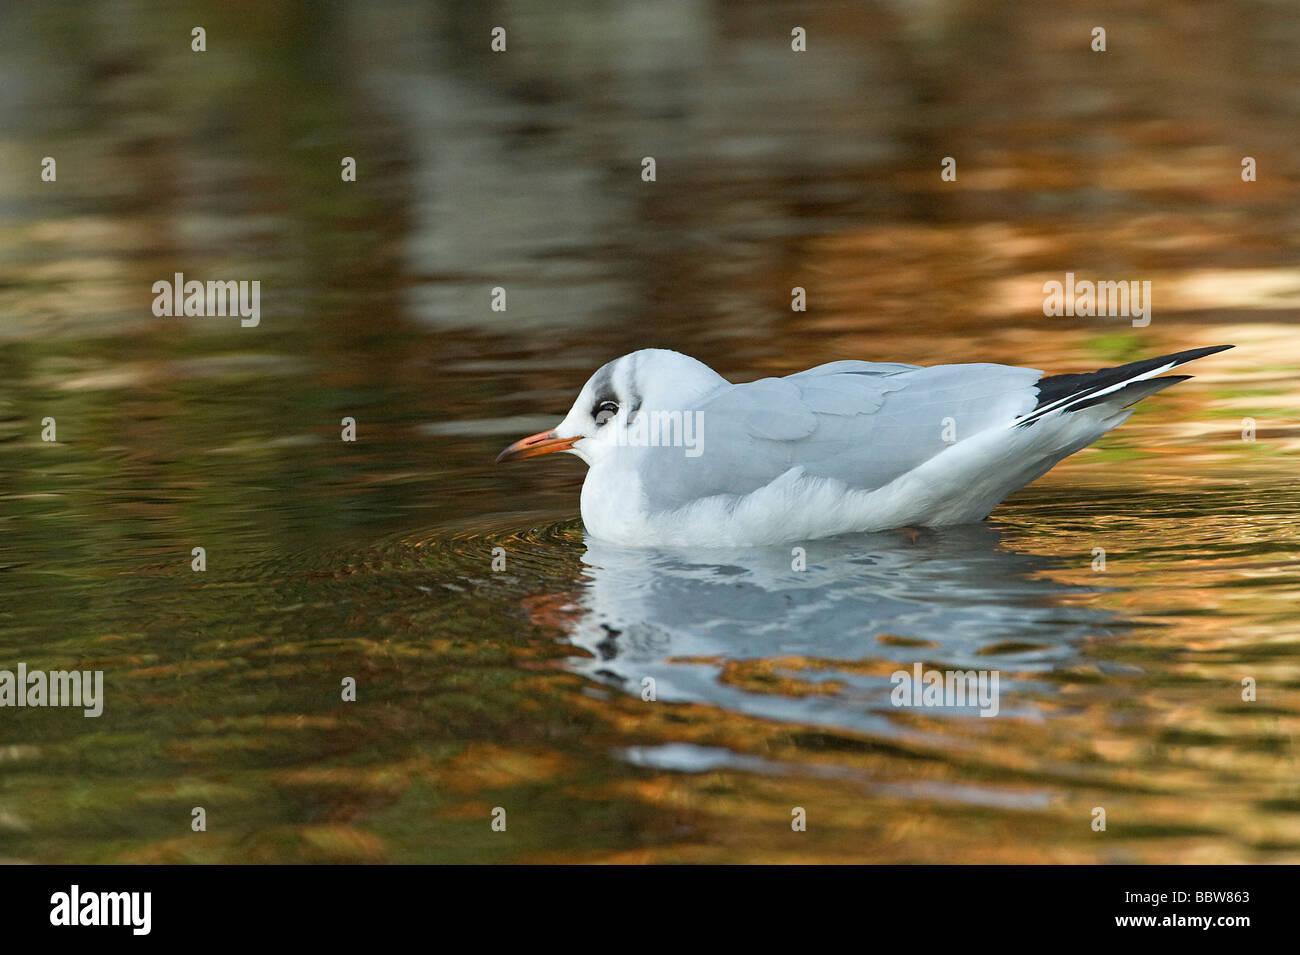 Black headed gull Larus ridibundus winter plumage adult swimming with reflection - Stock Image